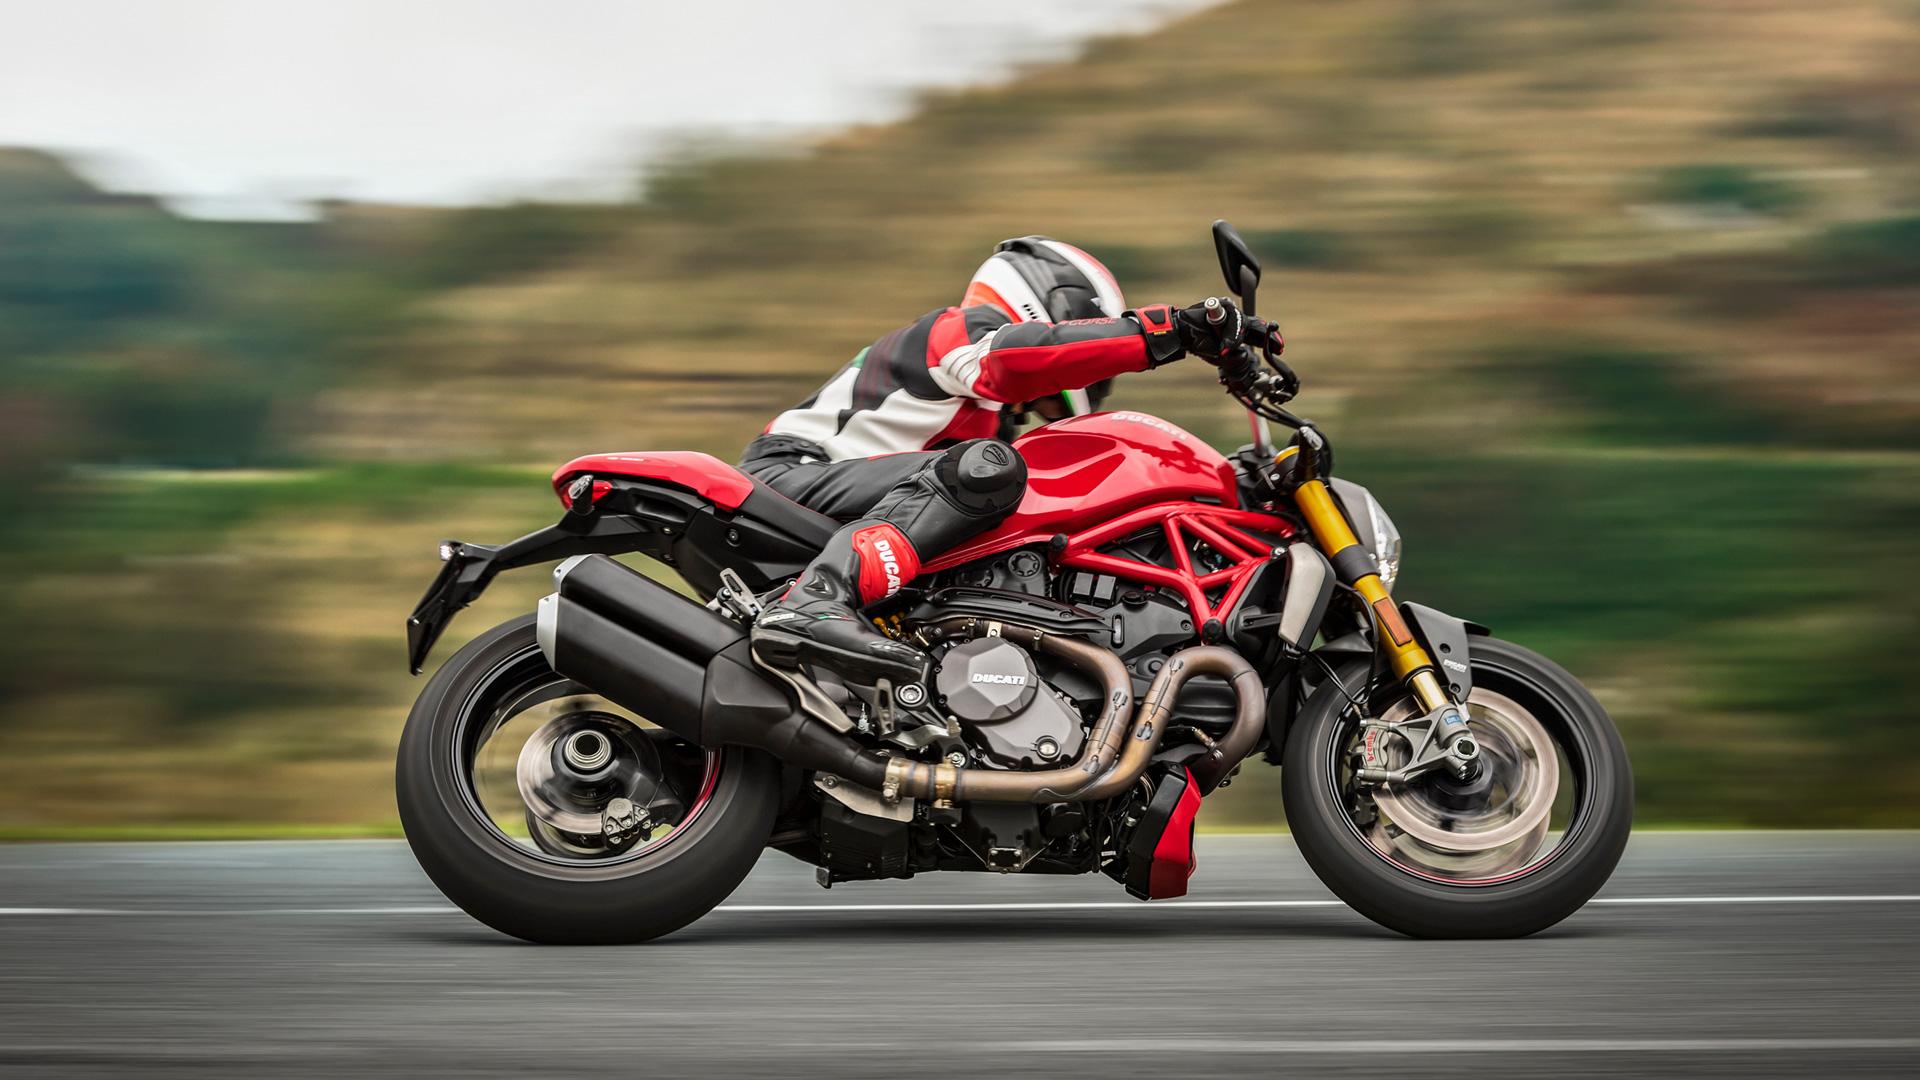 ducati monster 1200 high performance naked bikes. Black Bedroom Furniture Sets. Home Design Ideas